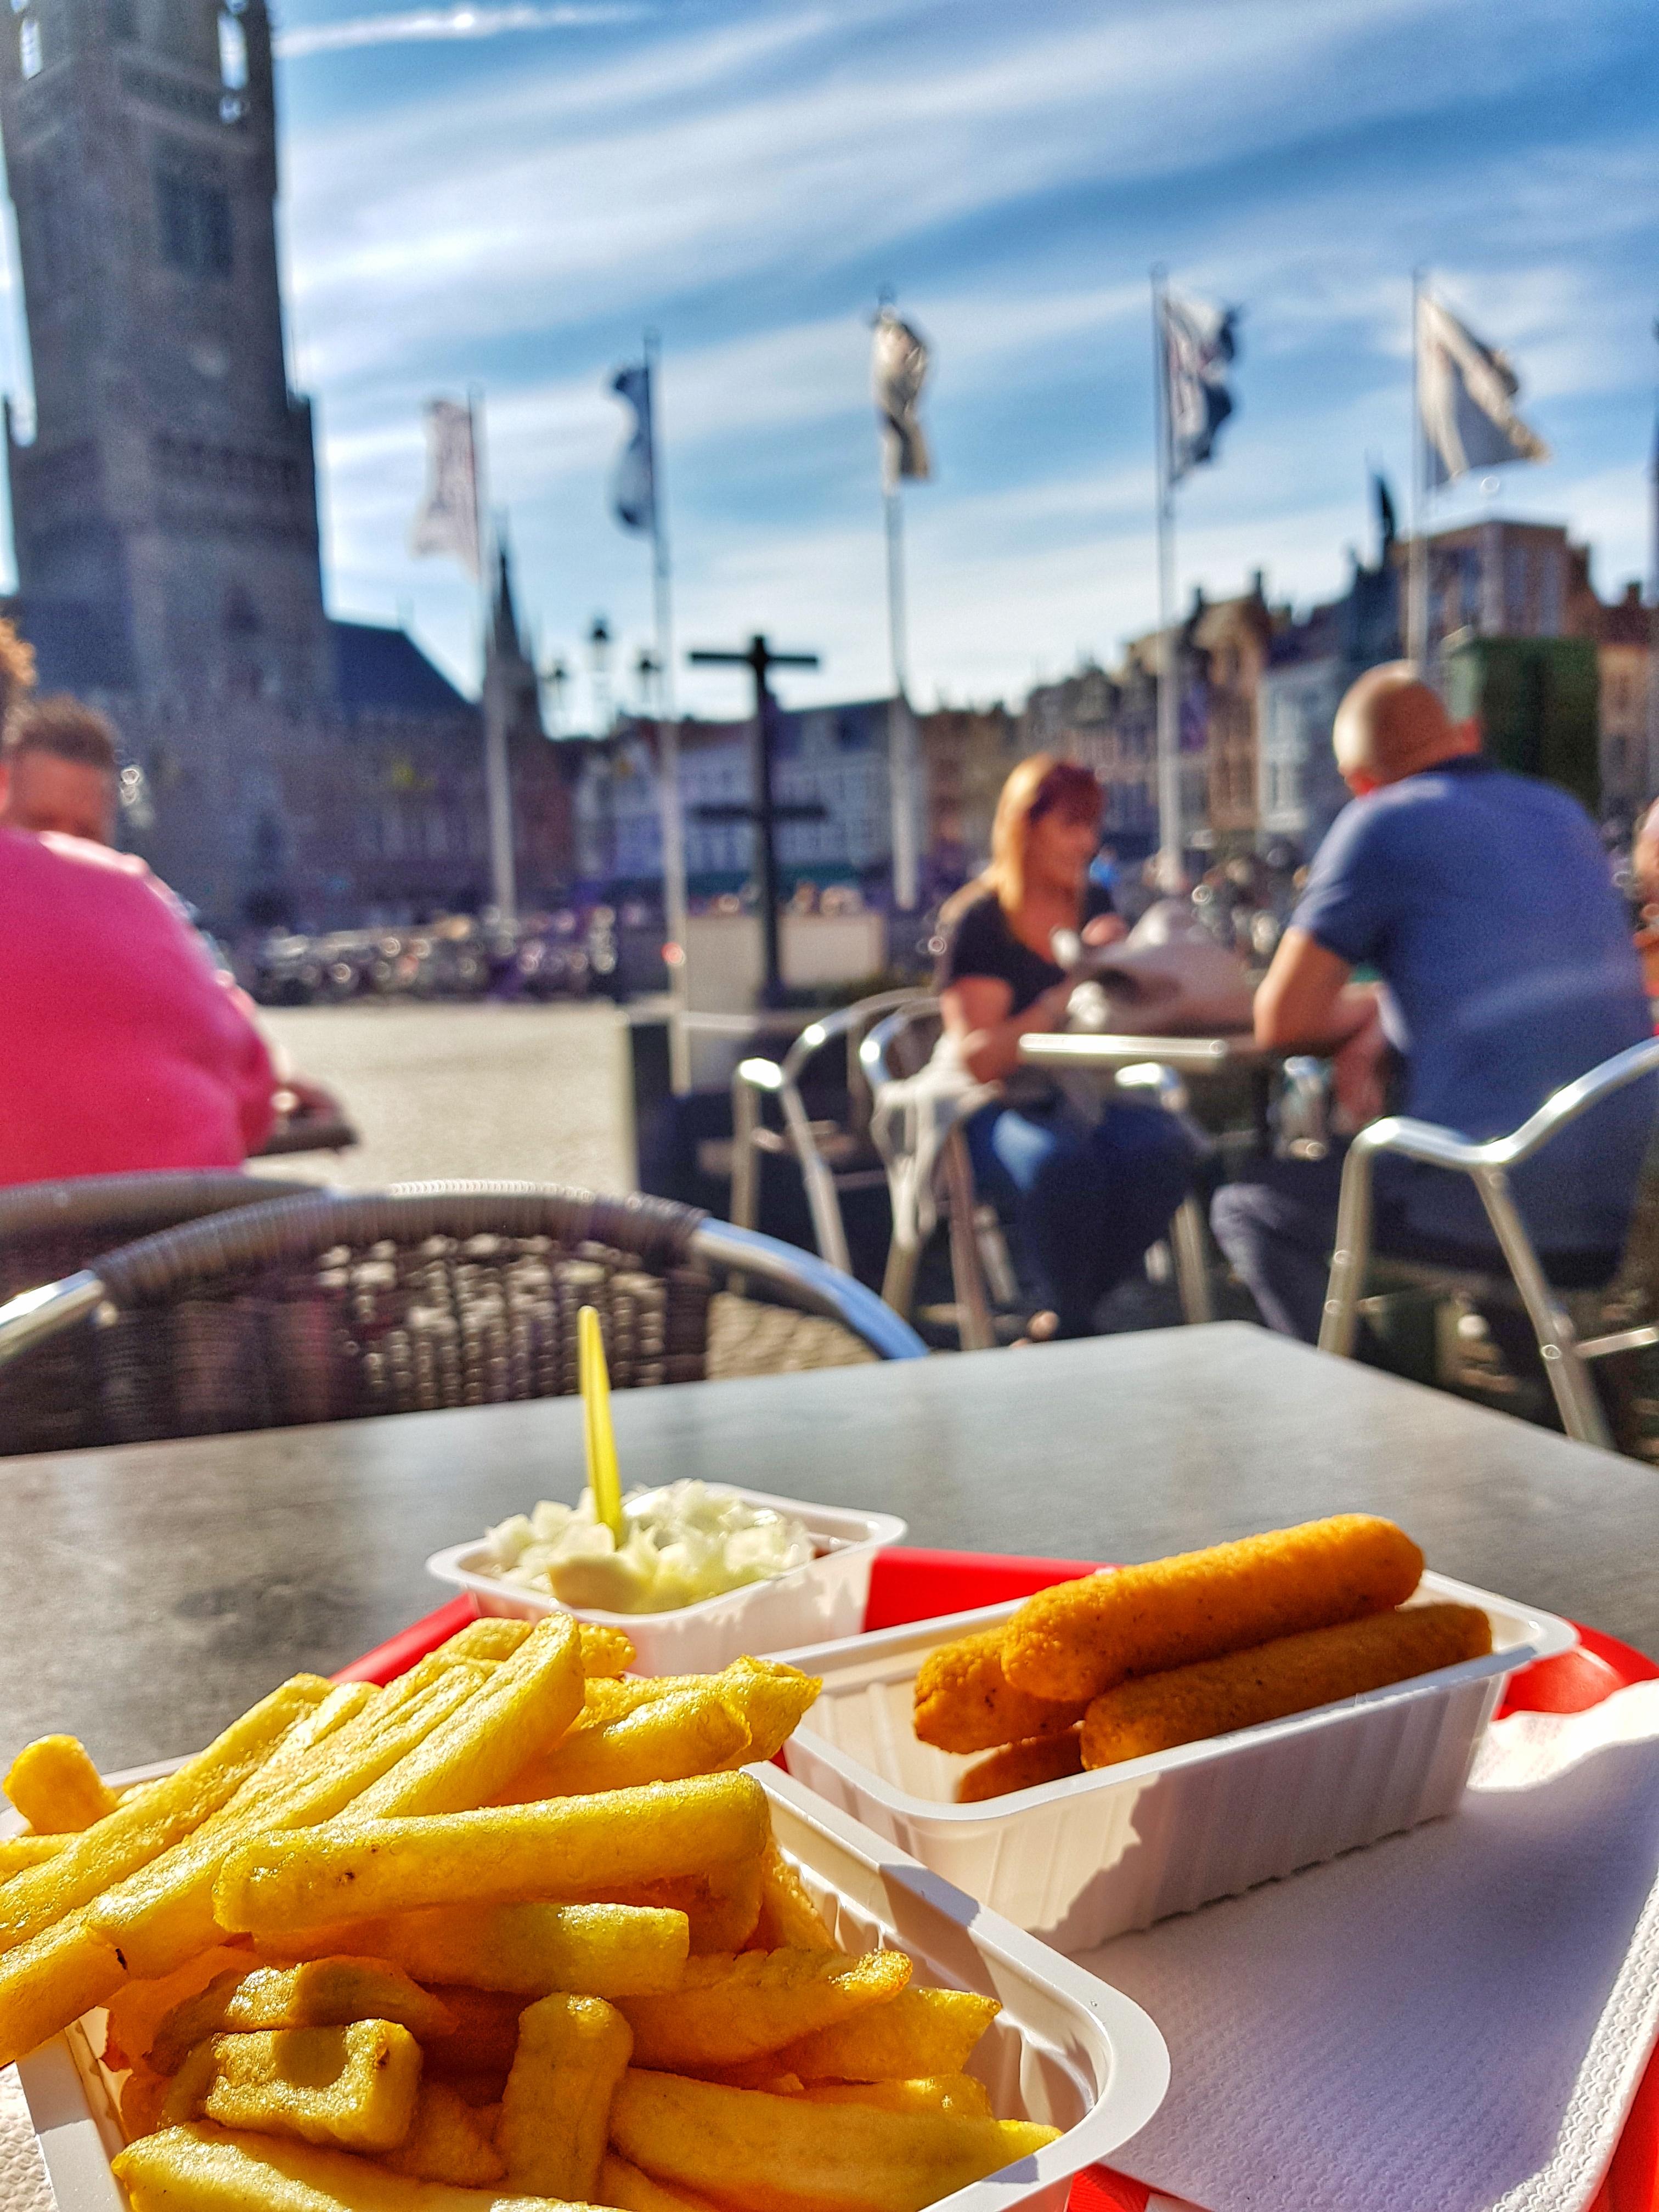 BelgiumFries)MarktSquare_Brugge_bruges